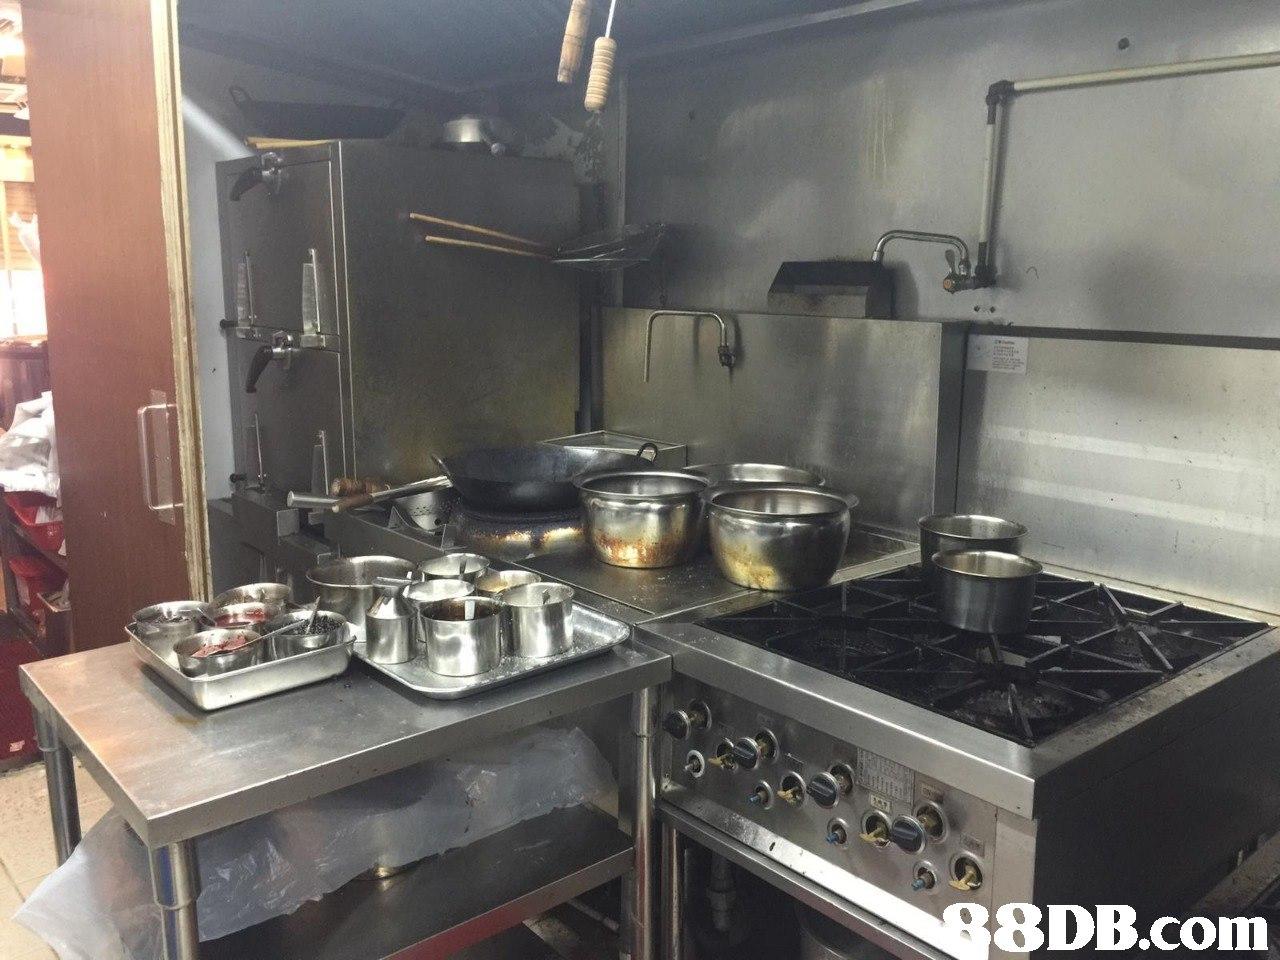 8DB.com  Property,Room,Kitchen stove,